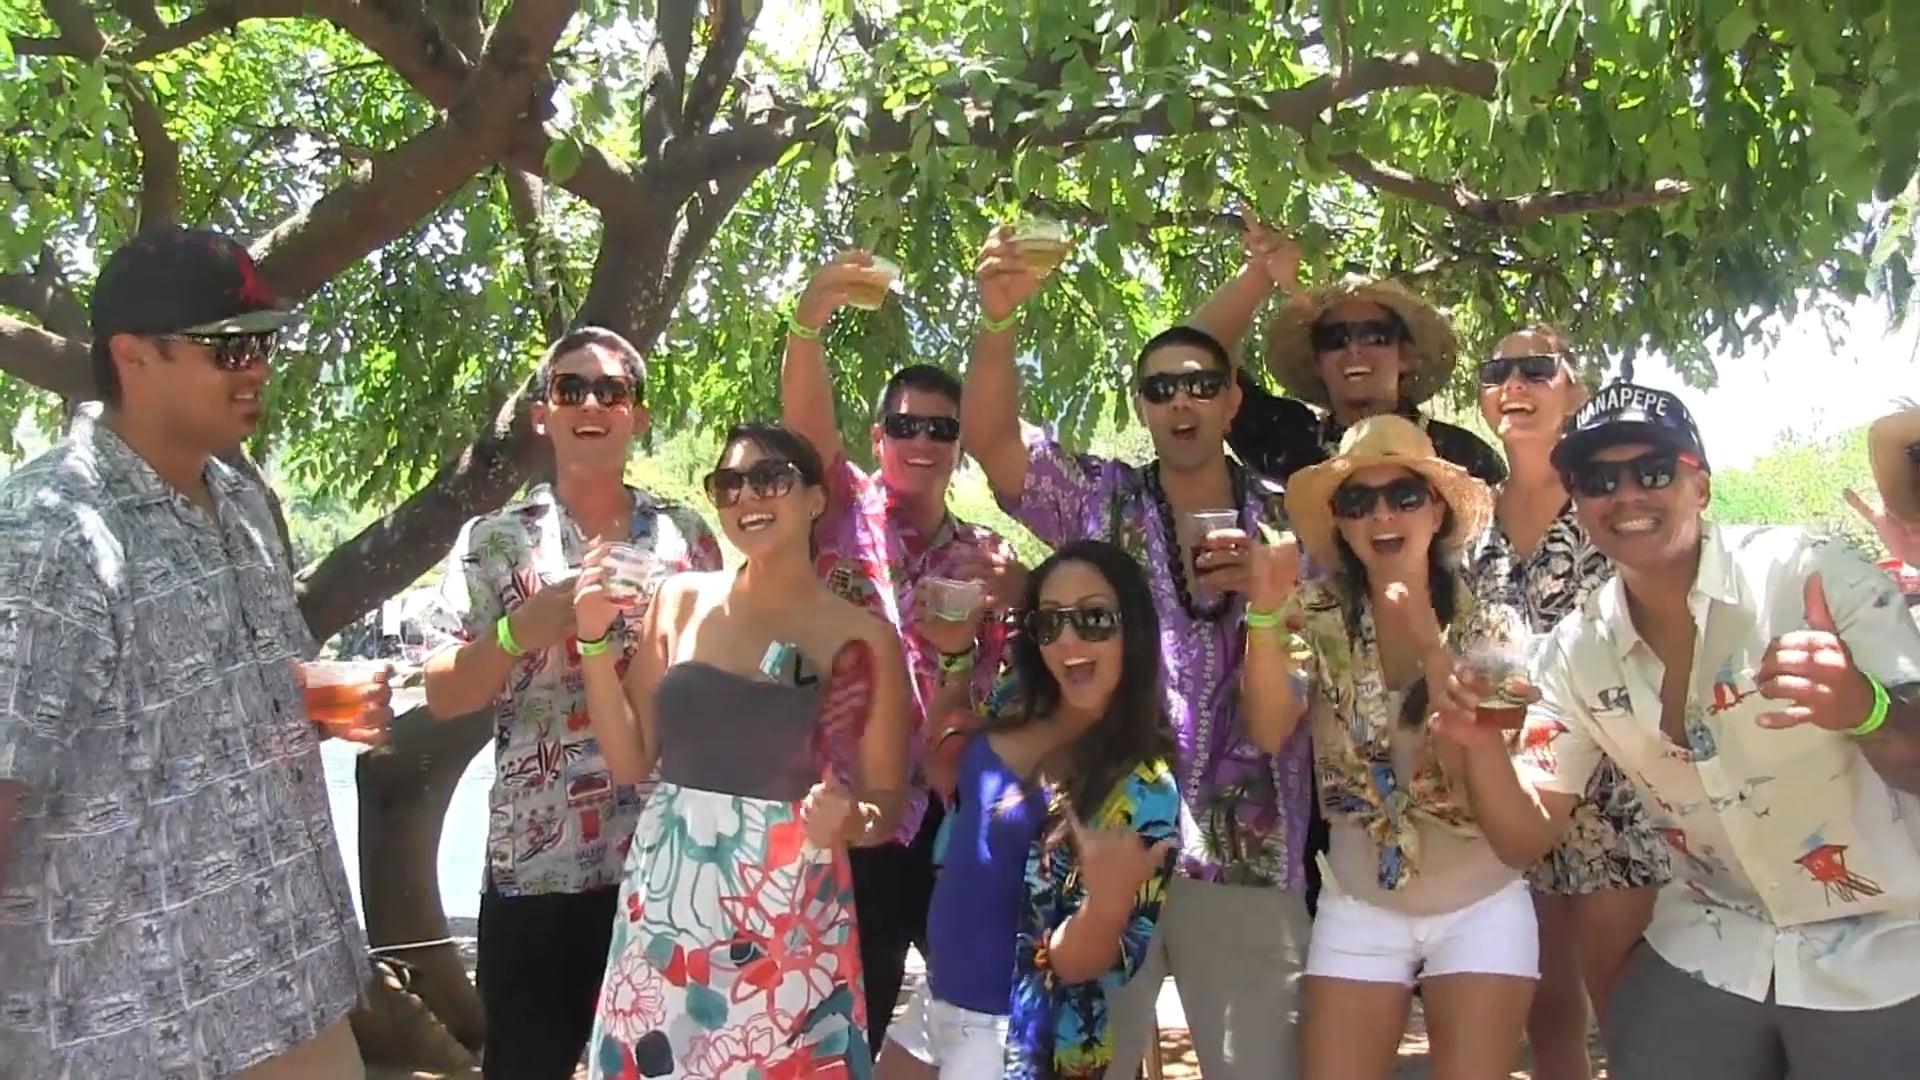 Taste of Hawaii - The Ultimate Sunday Brunch